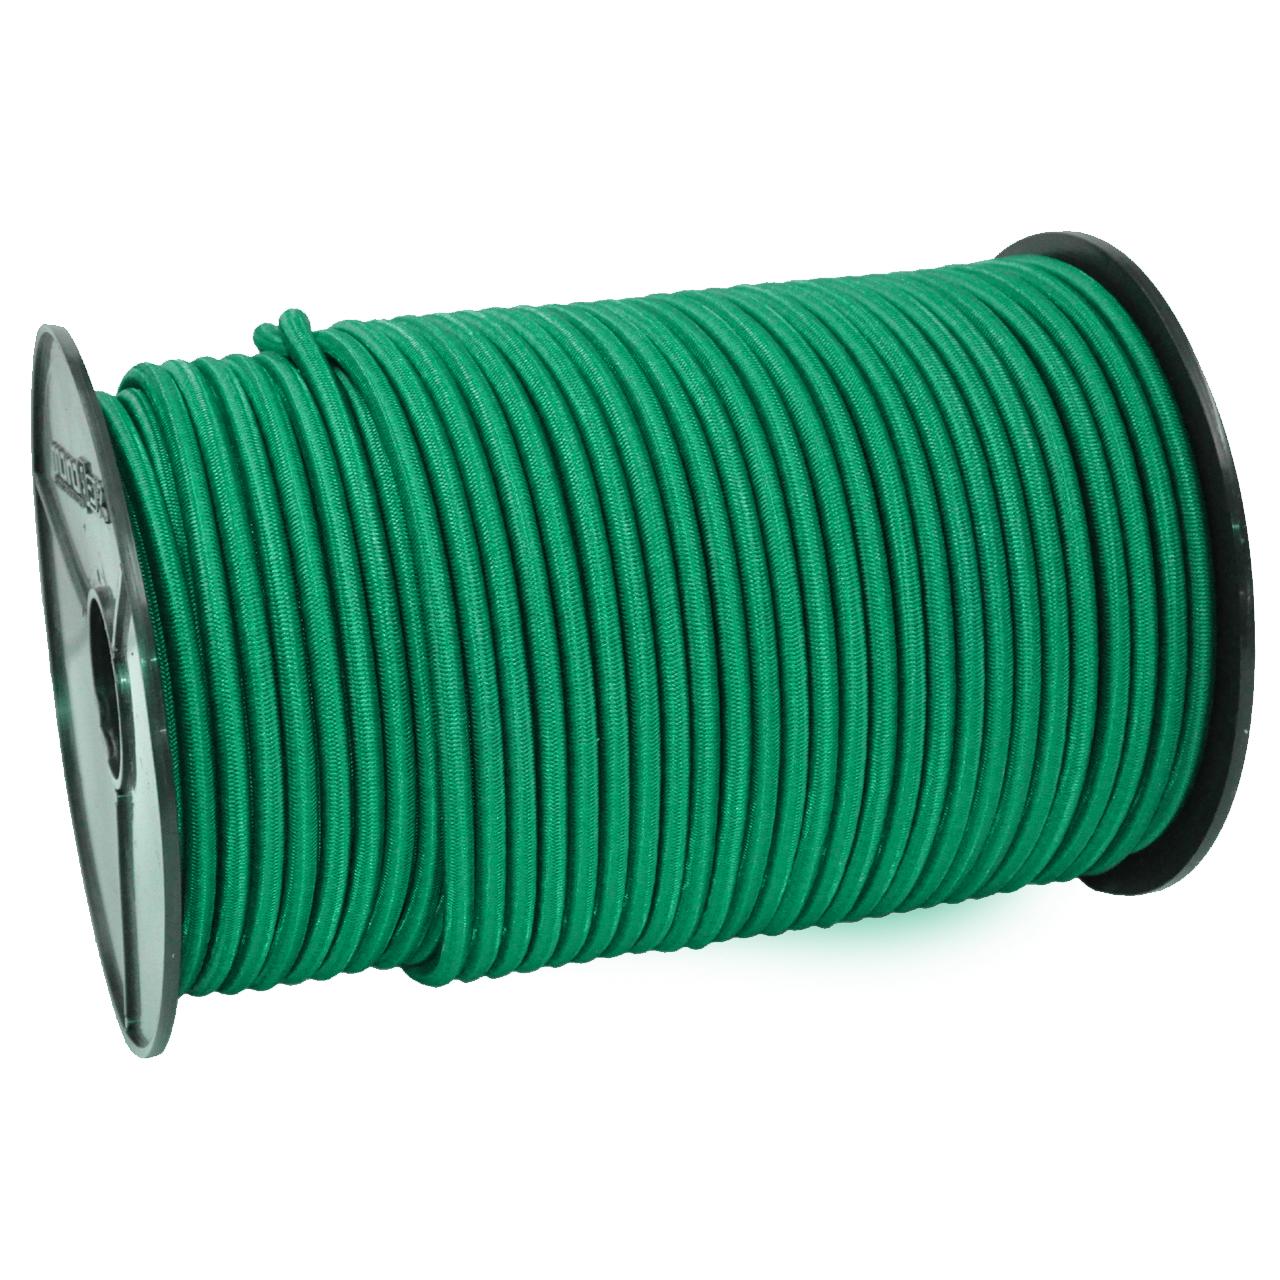 SCHNURHAUS - Monoflex Expanderseil mit Polyethylen (PE) Mantel grün